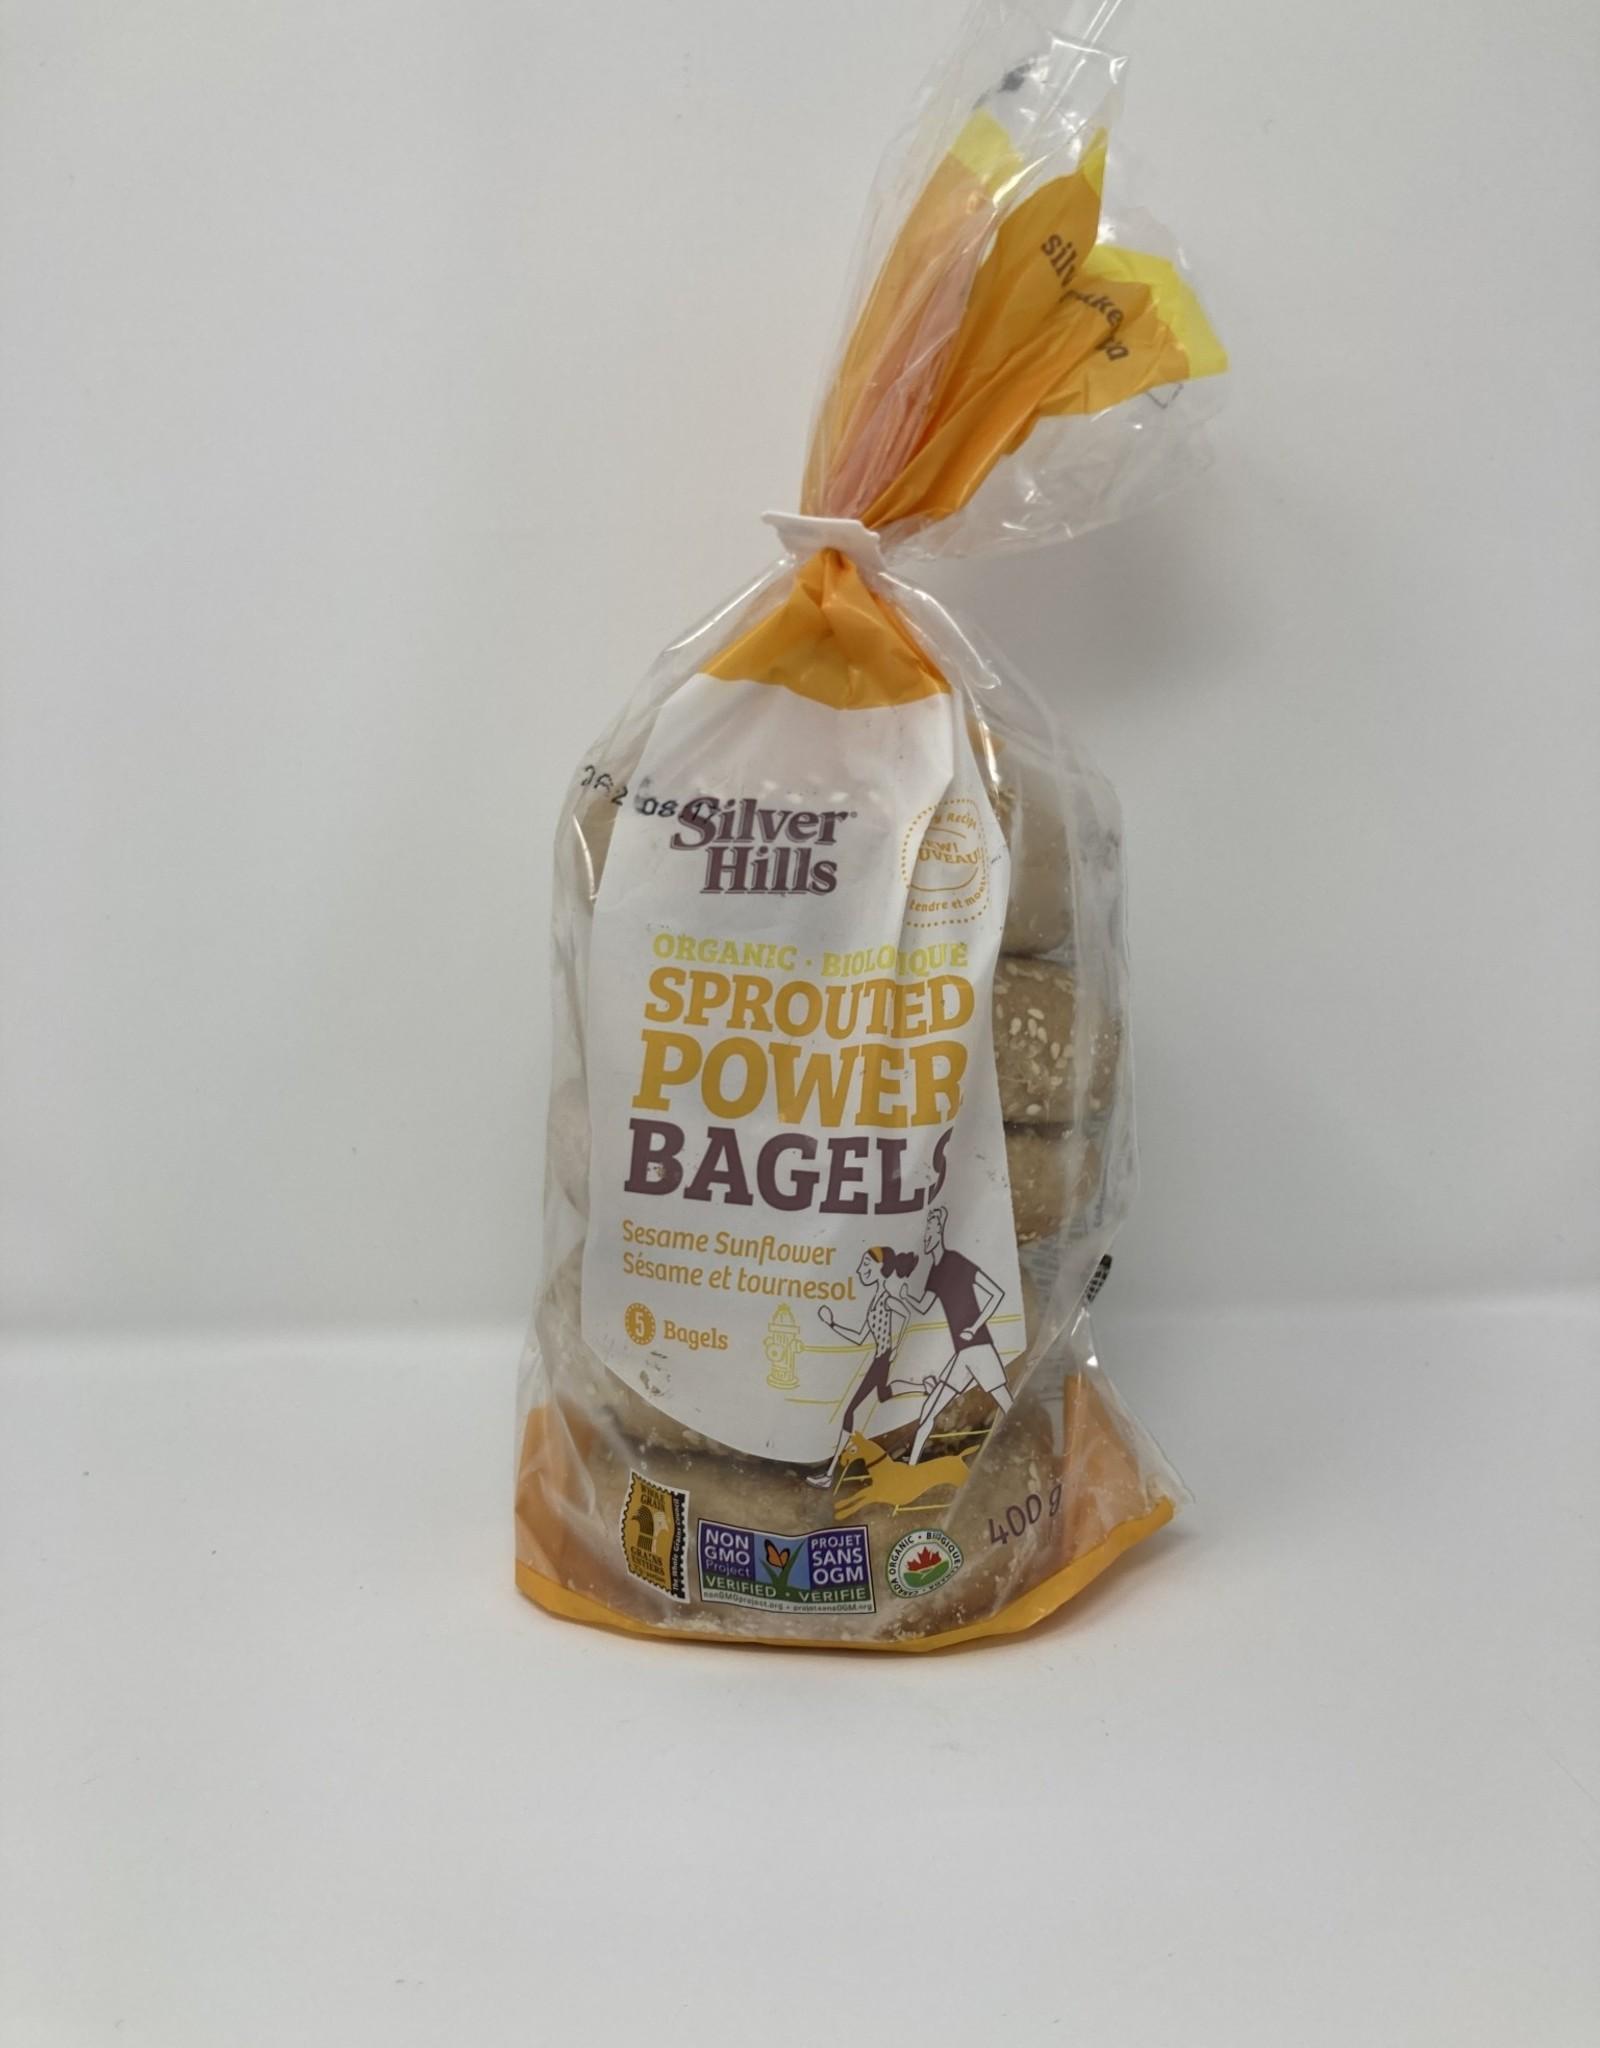 Silver Hills Bakery Silver HIlls - Bagels, Sesame Sunflower